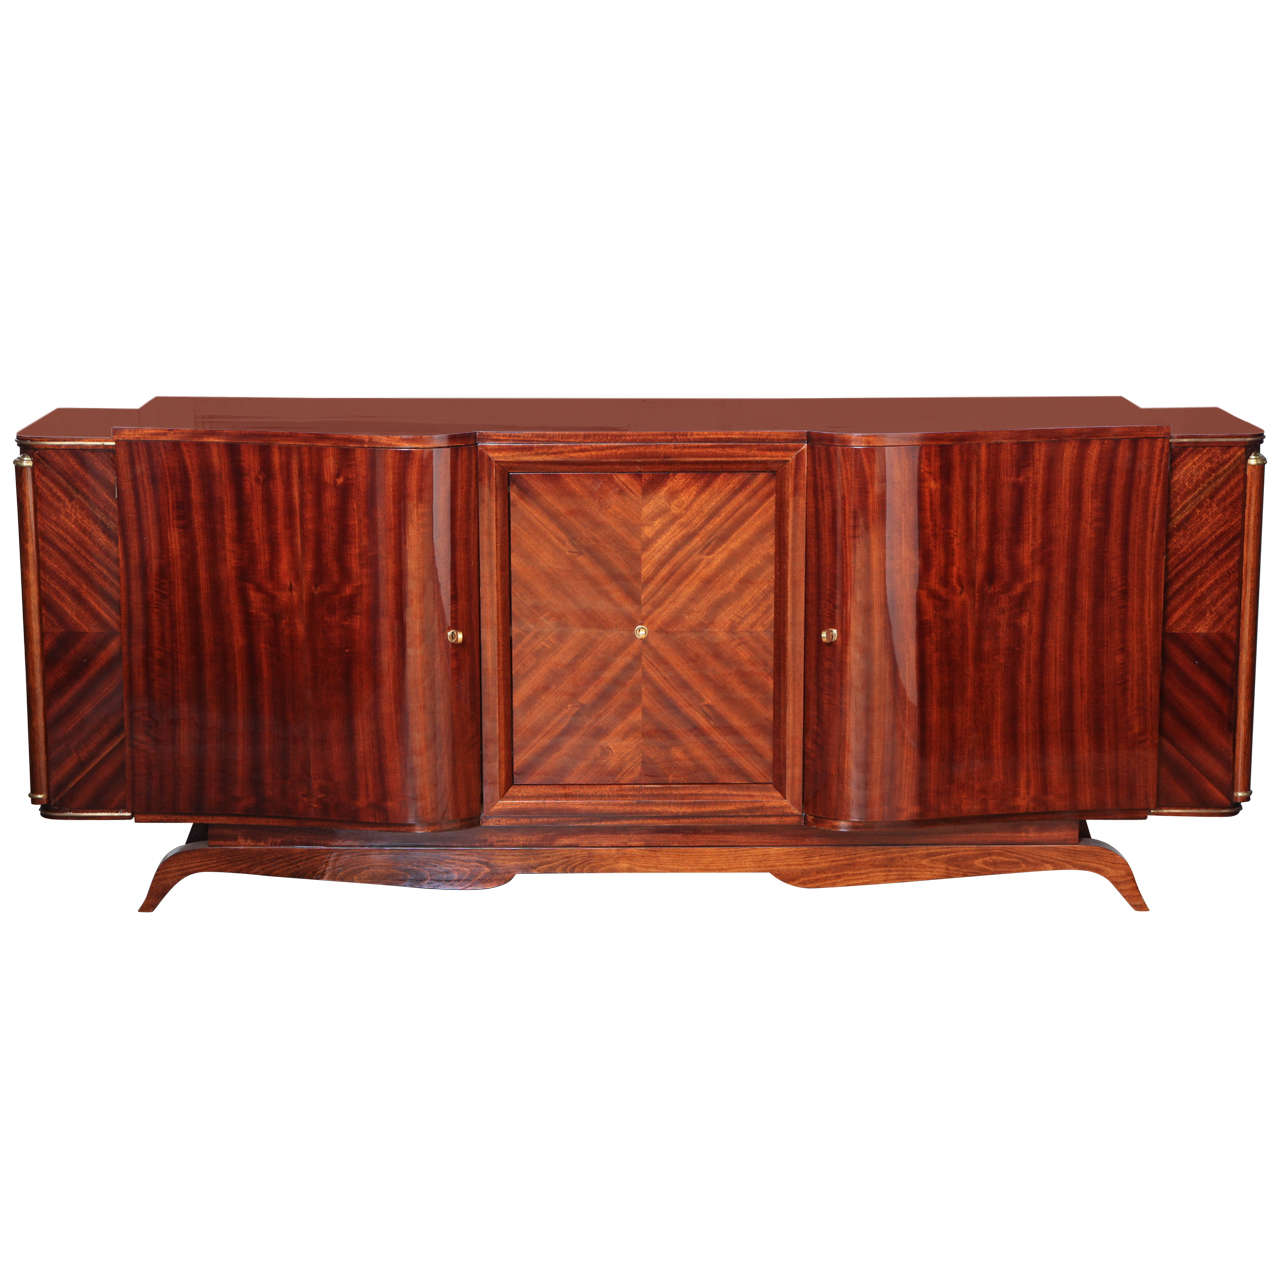 Unique Design Art Deco Sideboard or Bar 1